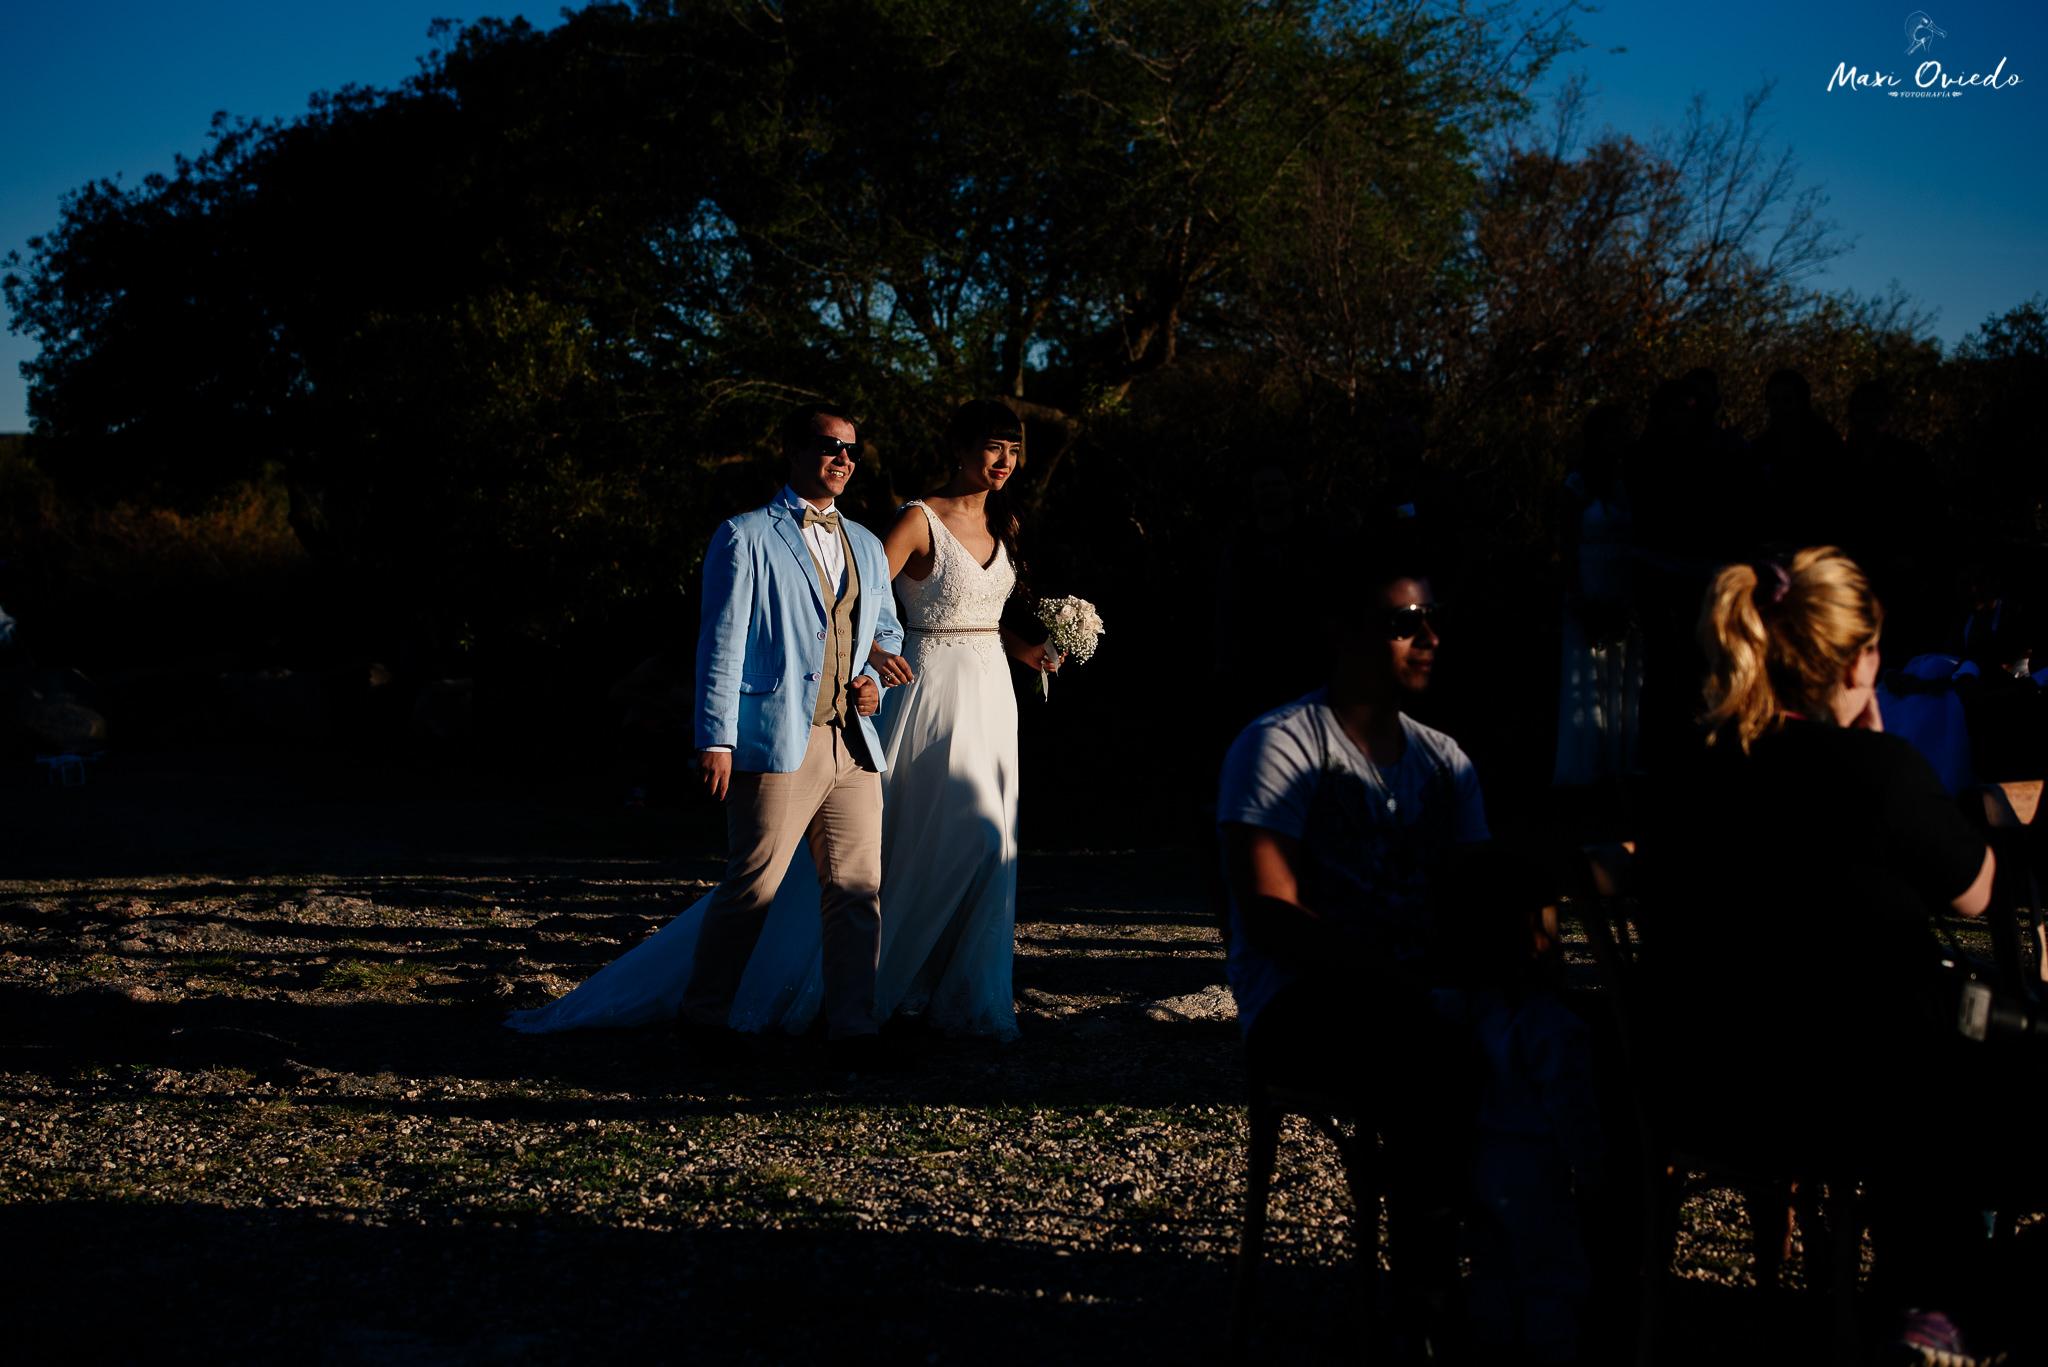 boda sextuple la cumbre cordoba cuchi corral fotografo de bodas fotografo de casamientos rosario san nicolas argentina vestido de novia ramo de novia-23.jpg